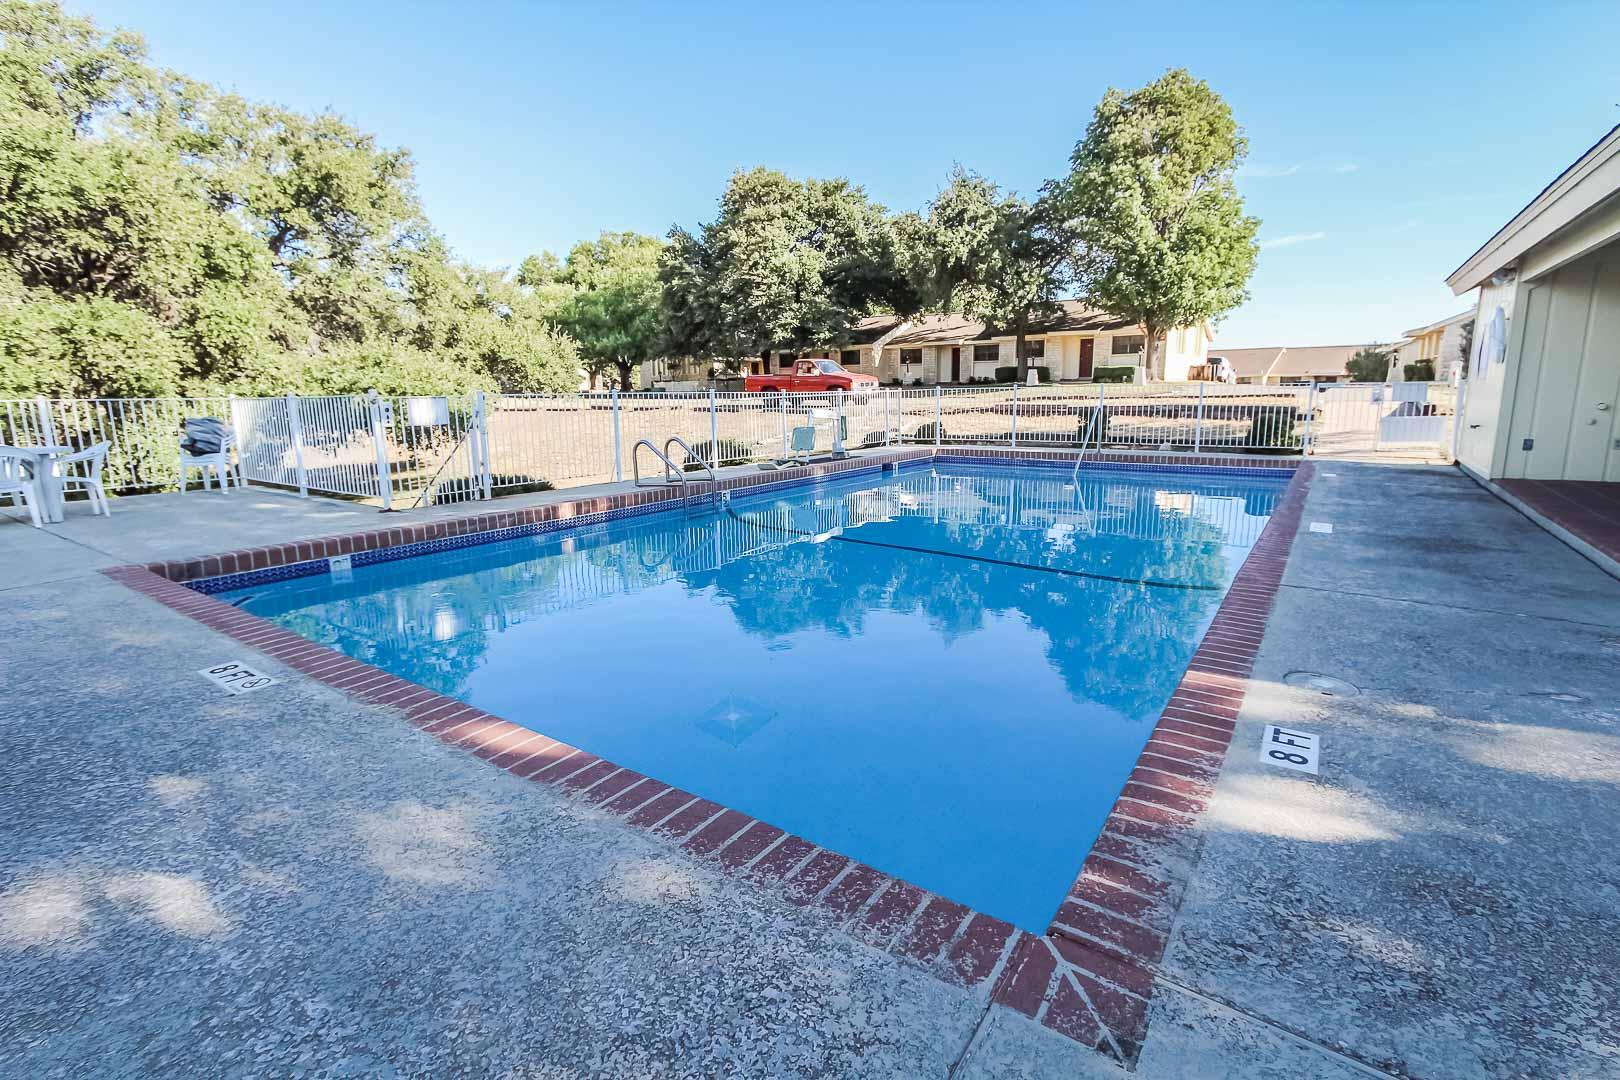 Shores at Lake Travis - Resort amenities - Pool